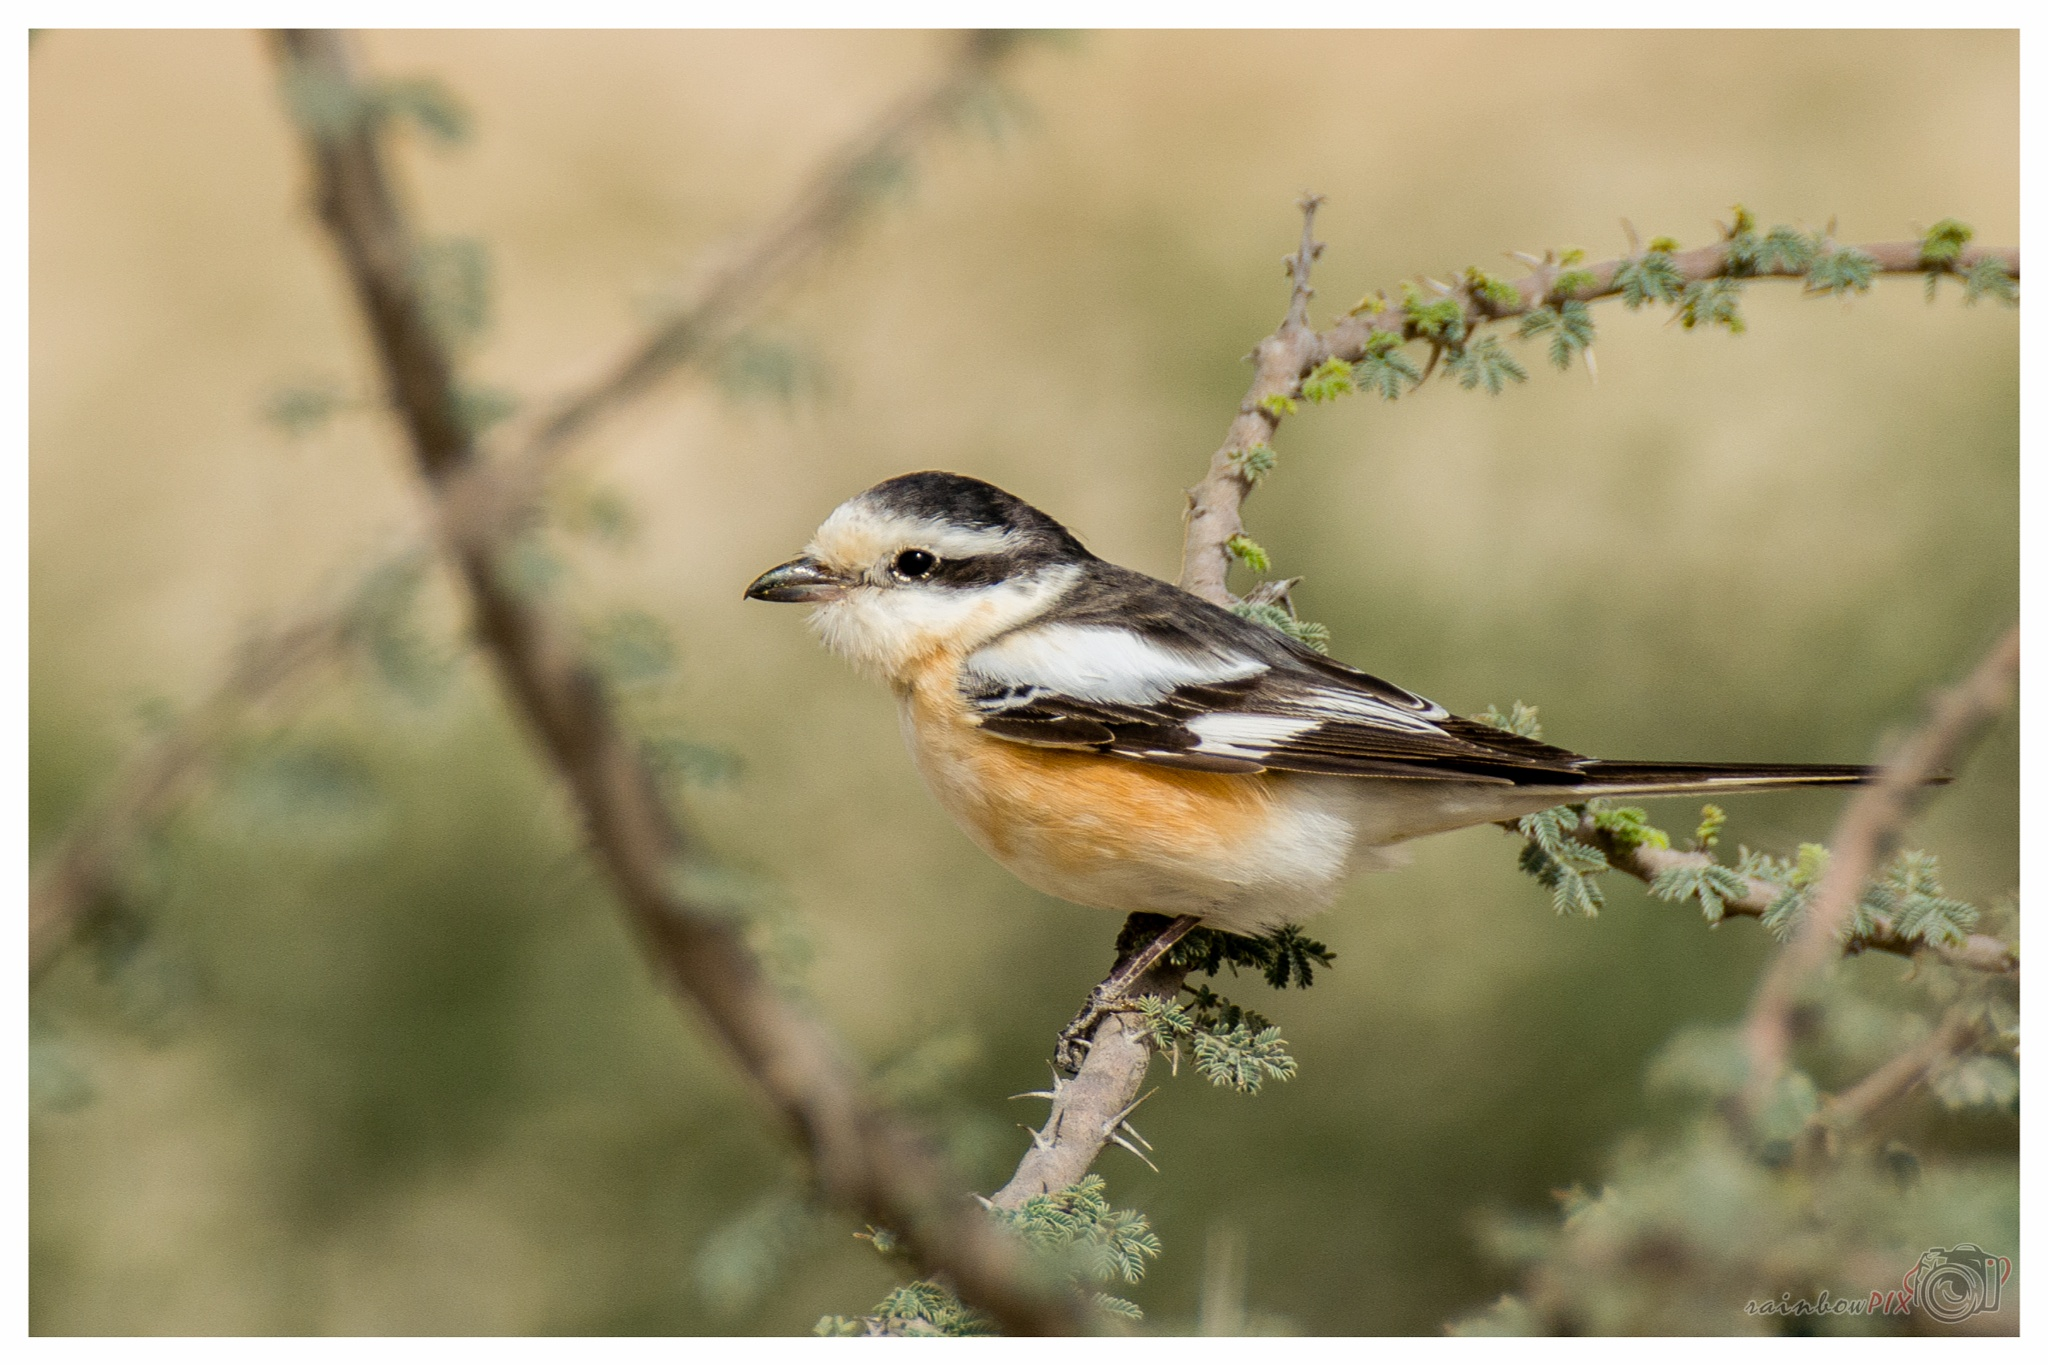 Masked Shrike by Jude Vincy